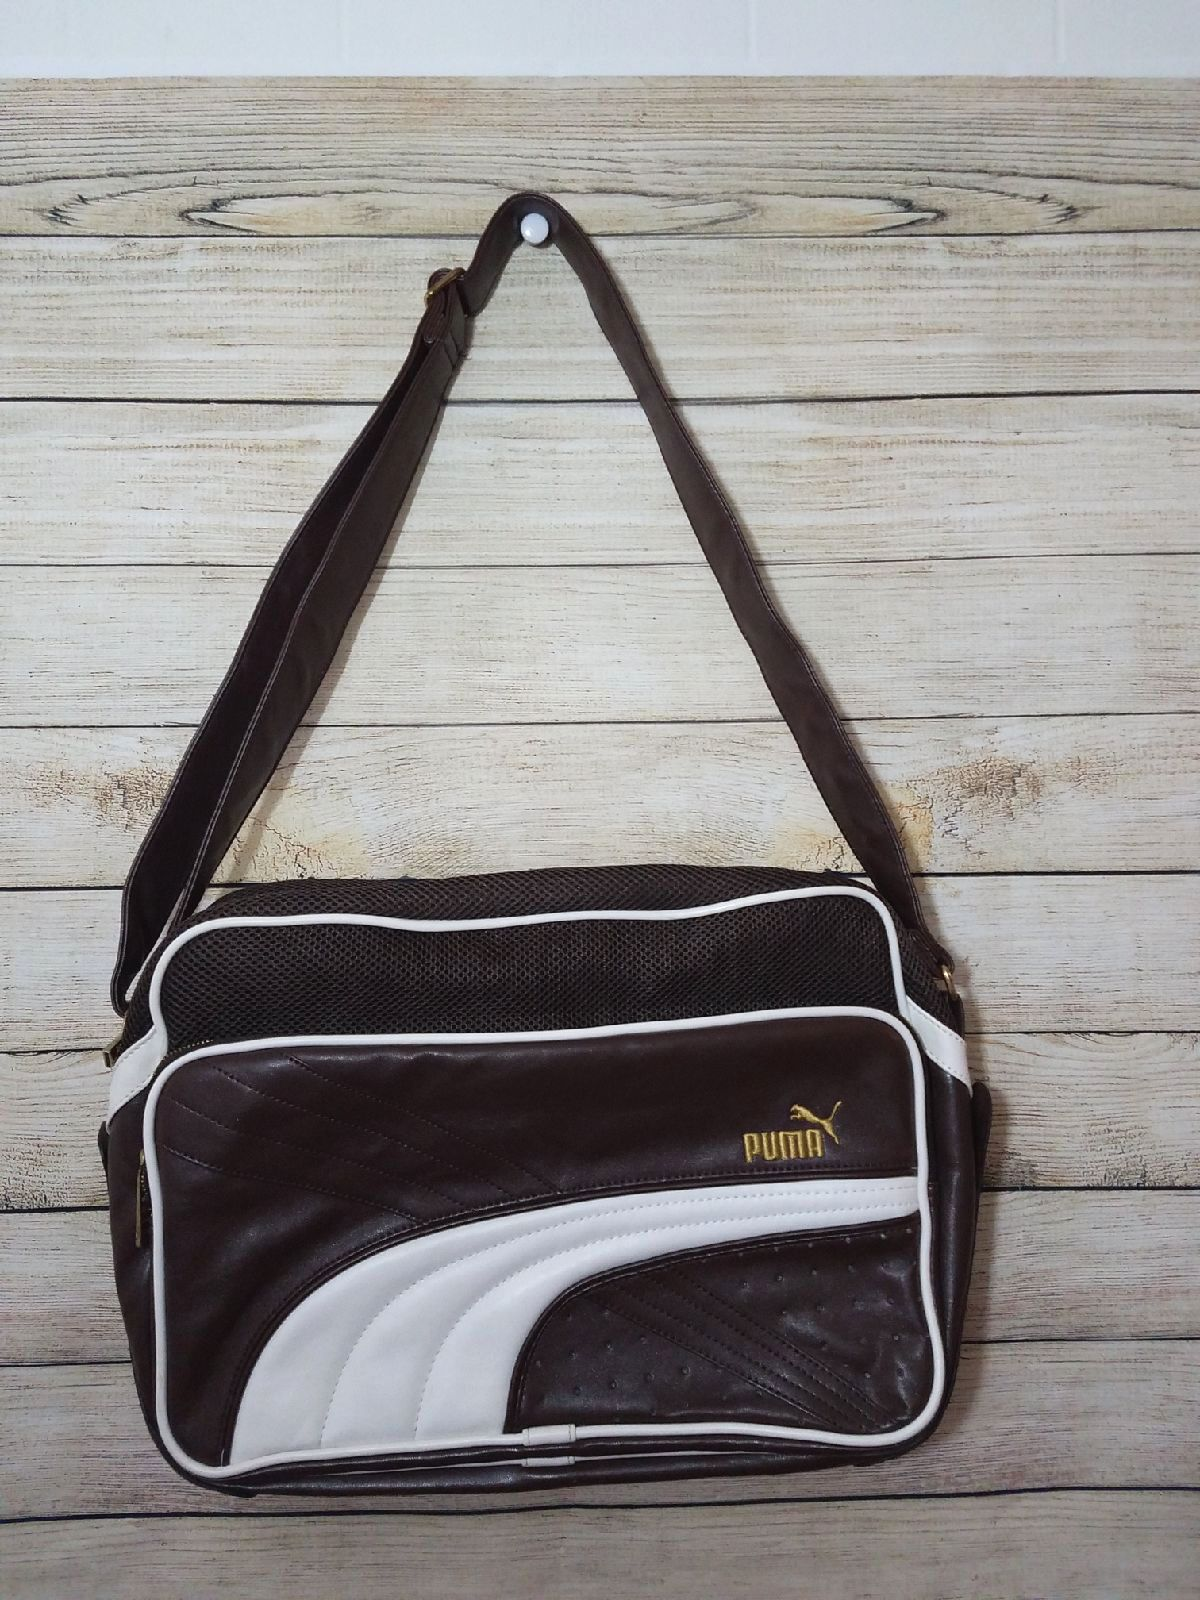 Puma Laptop Bag